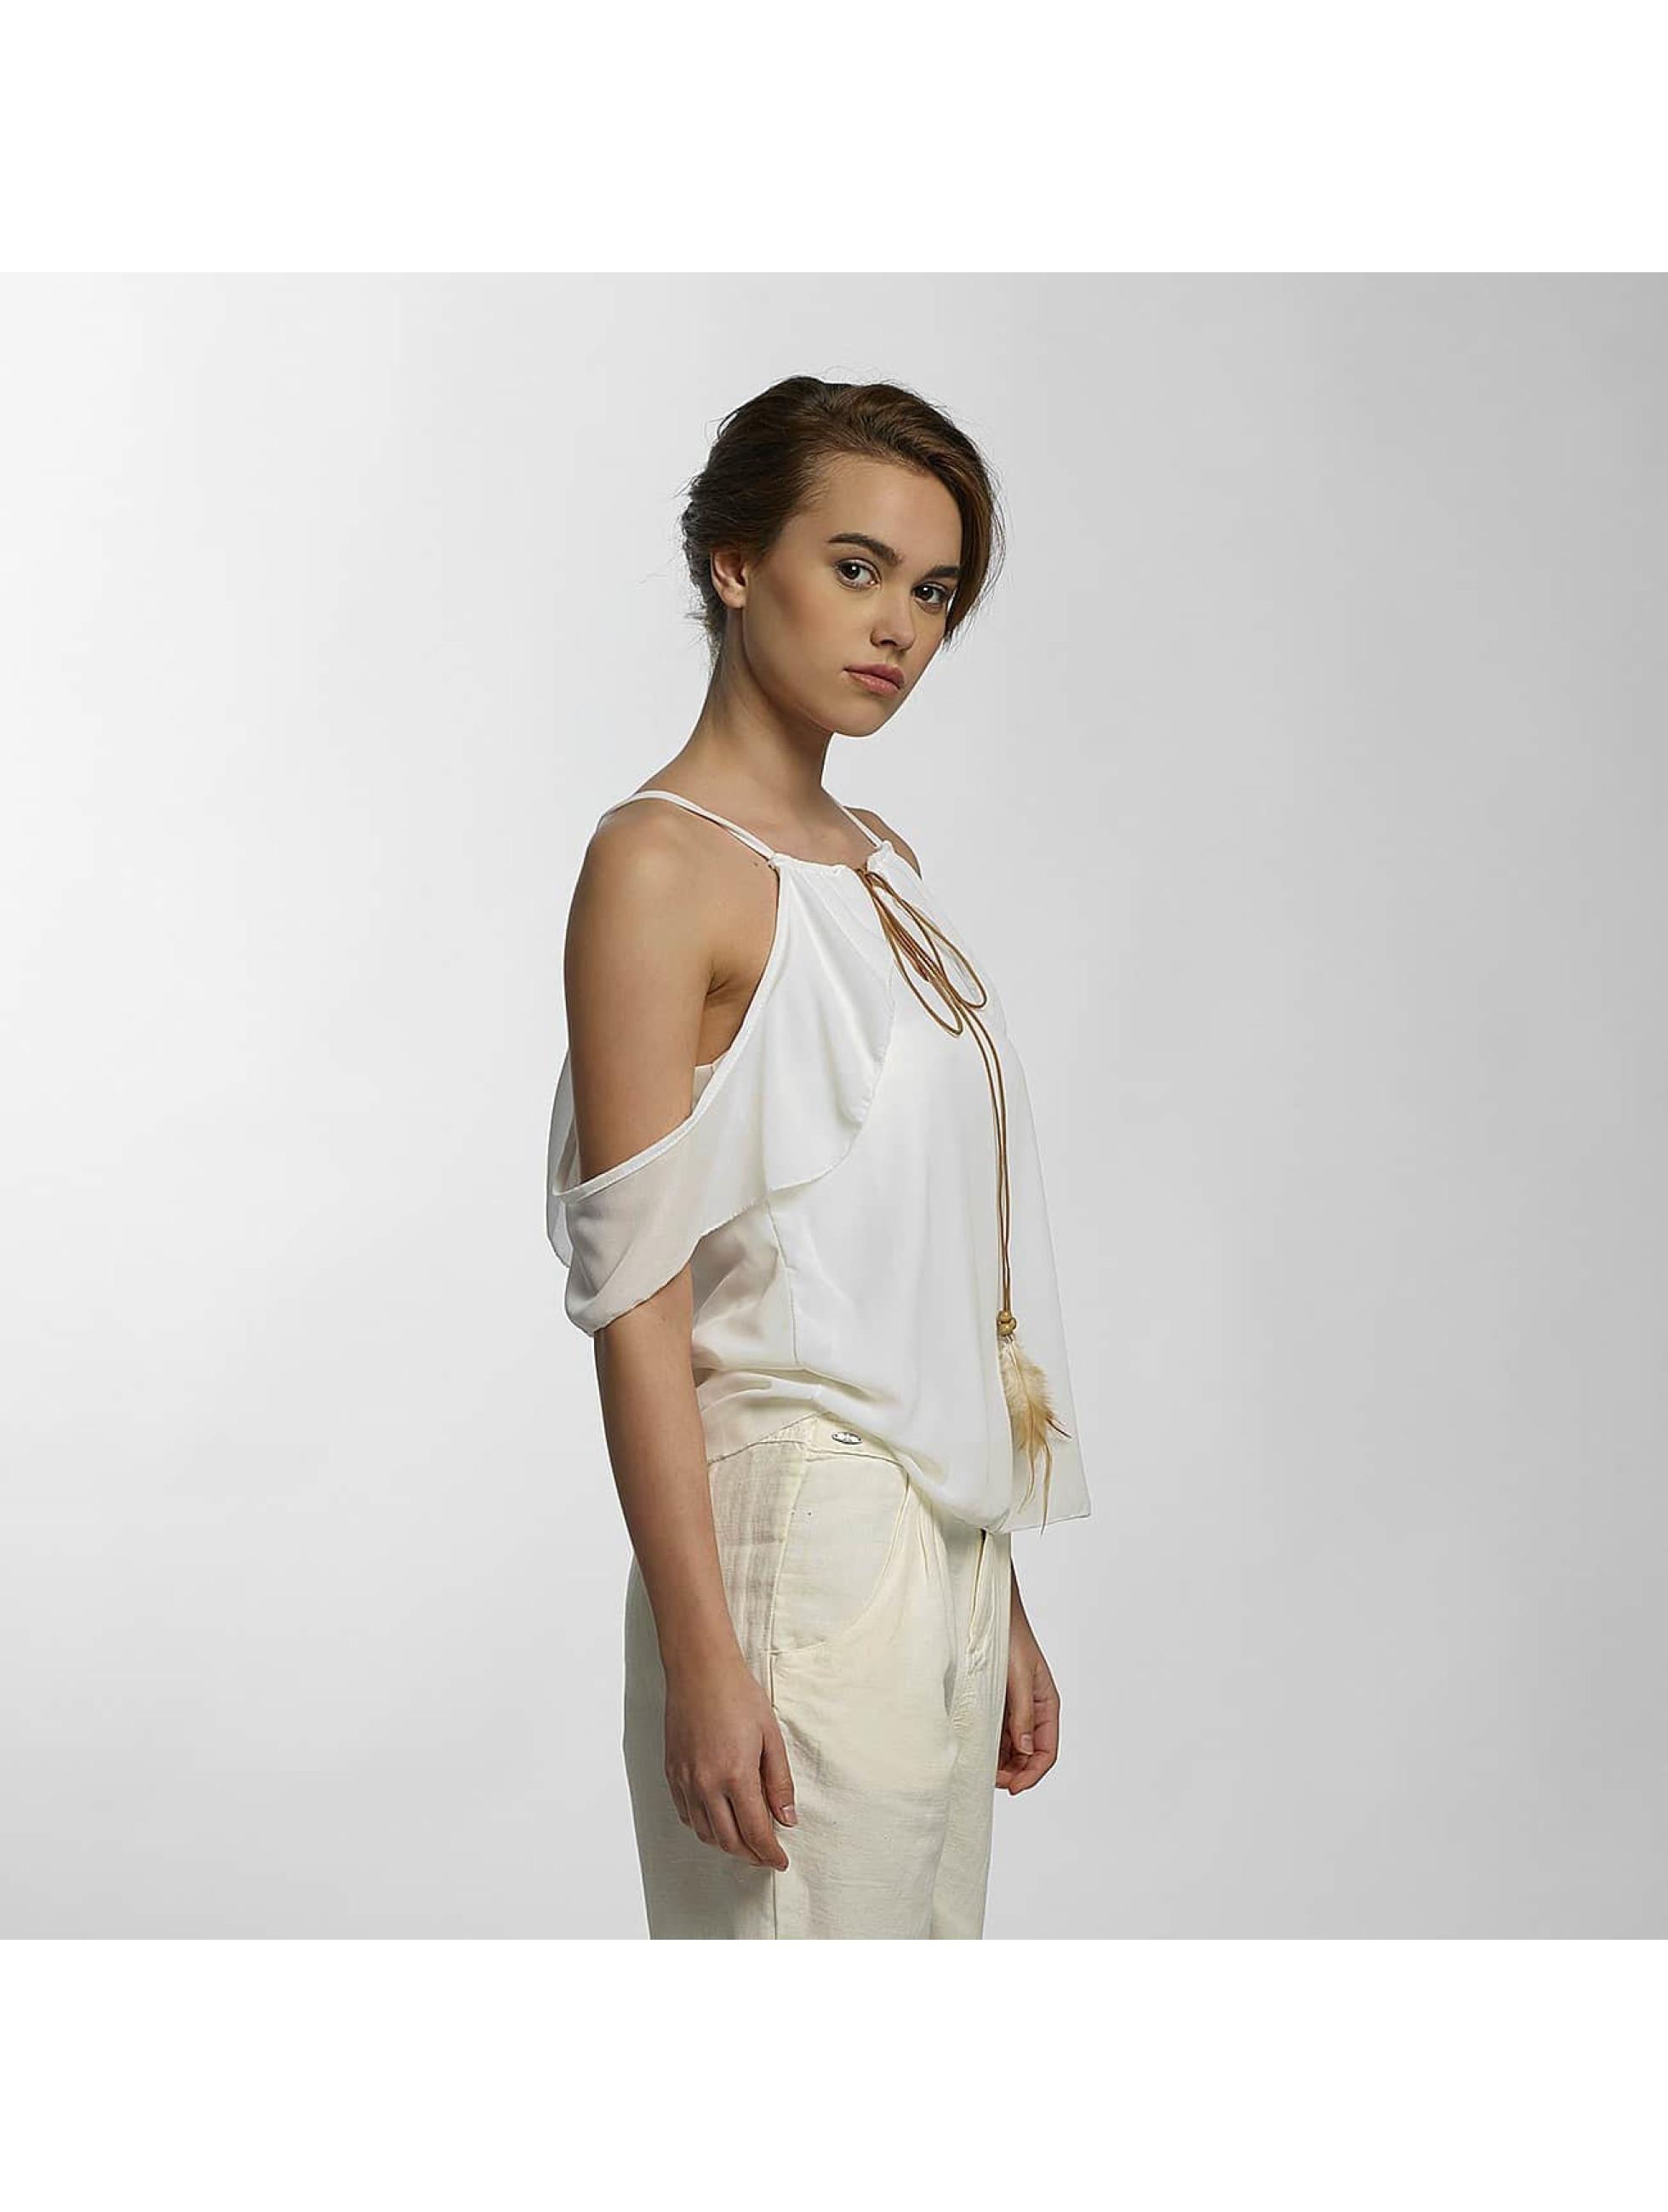 Hailys Frauen Top Biannia in weiß